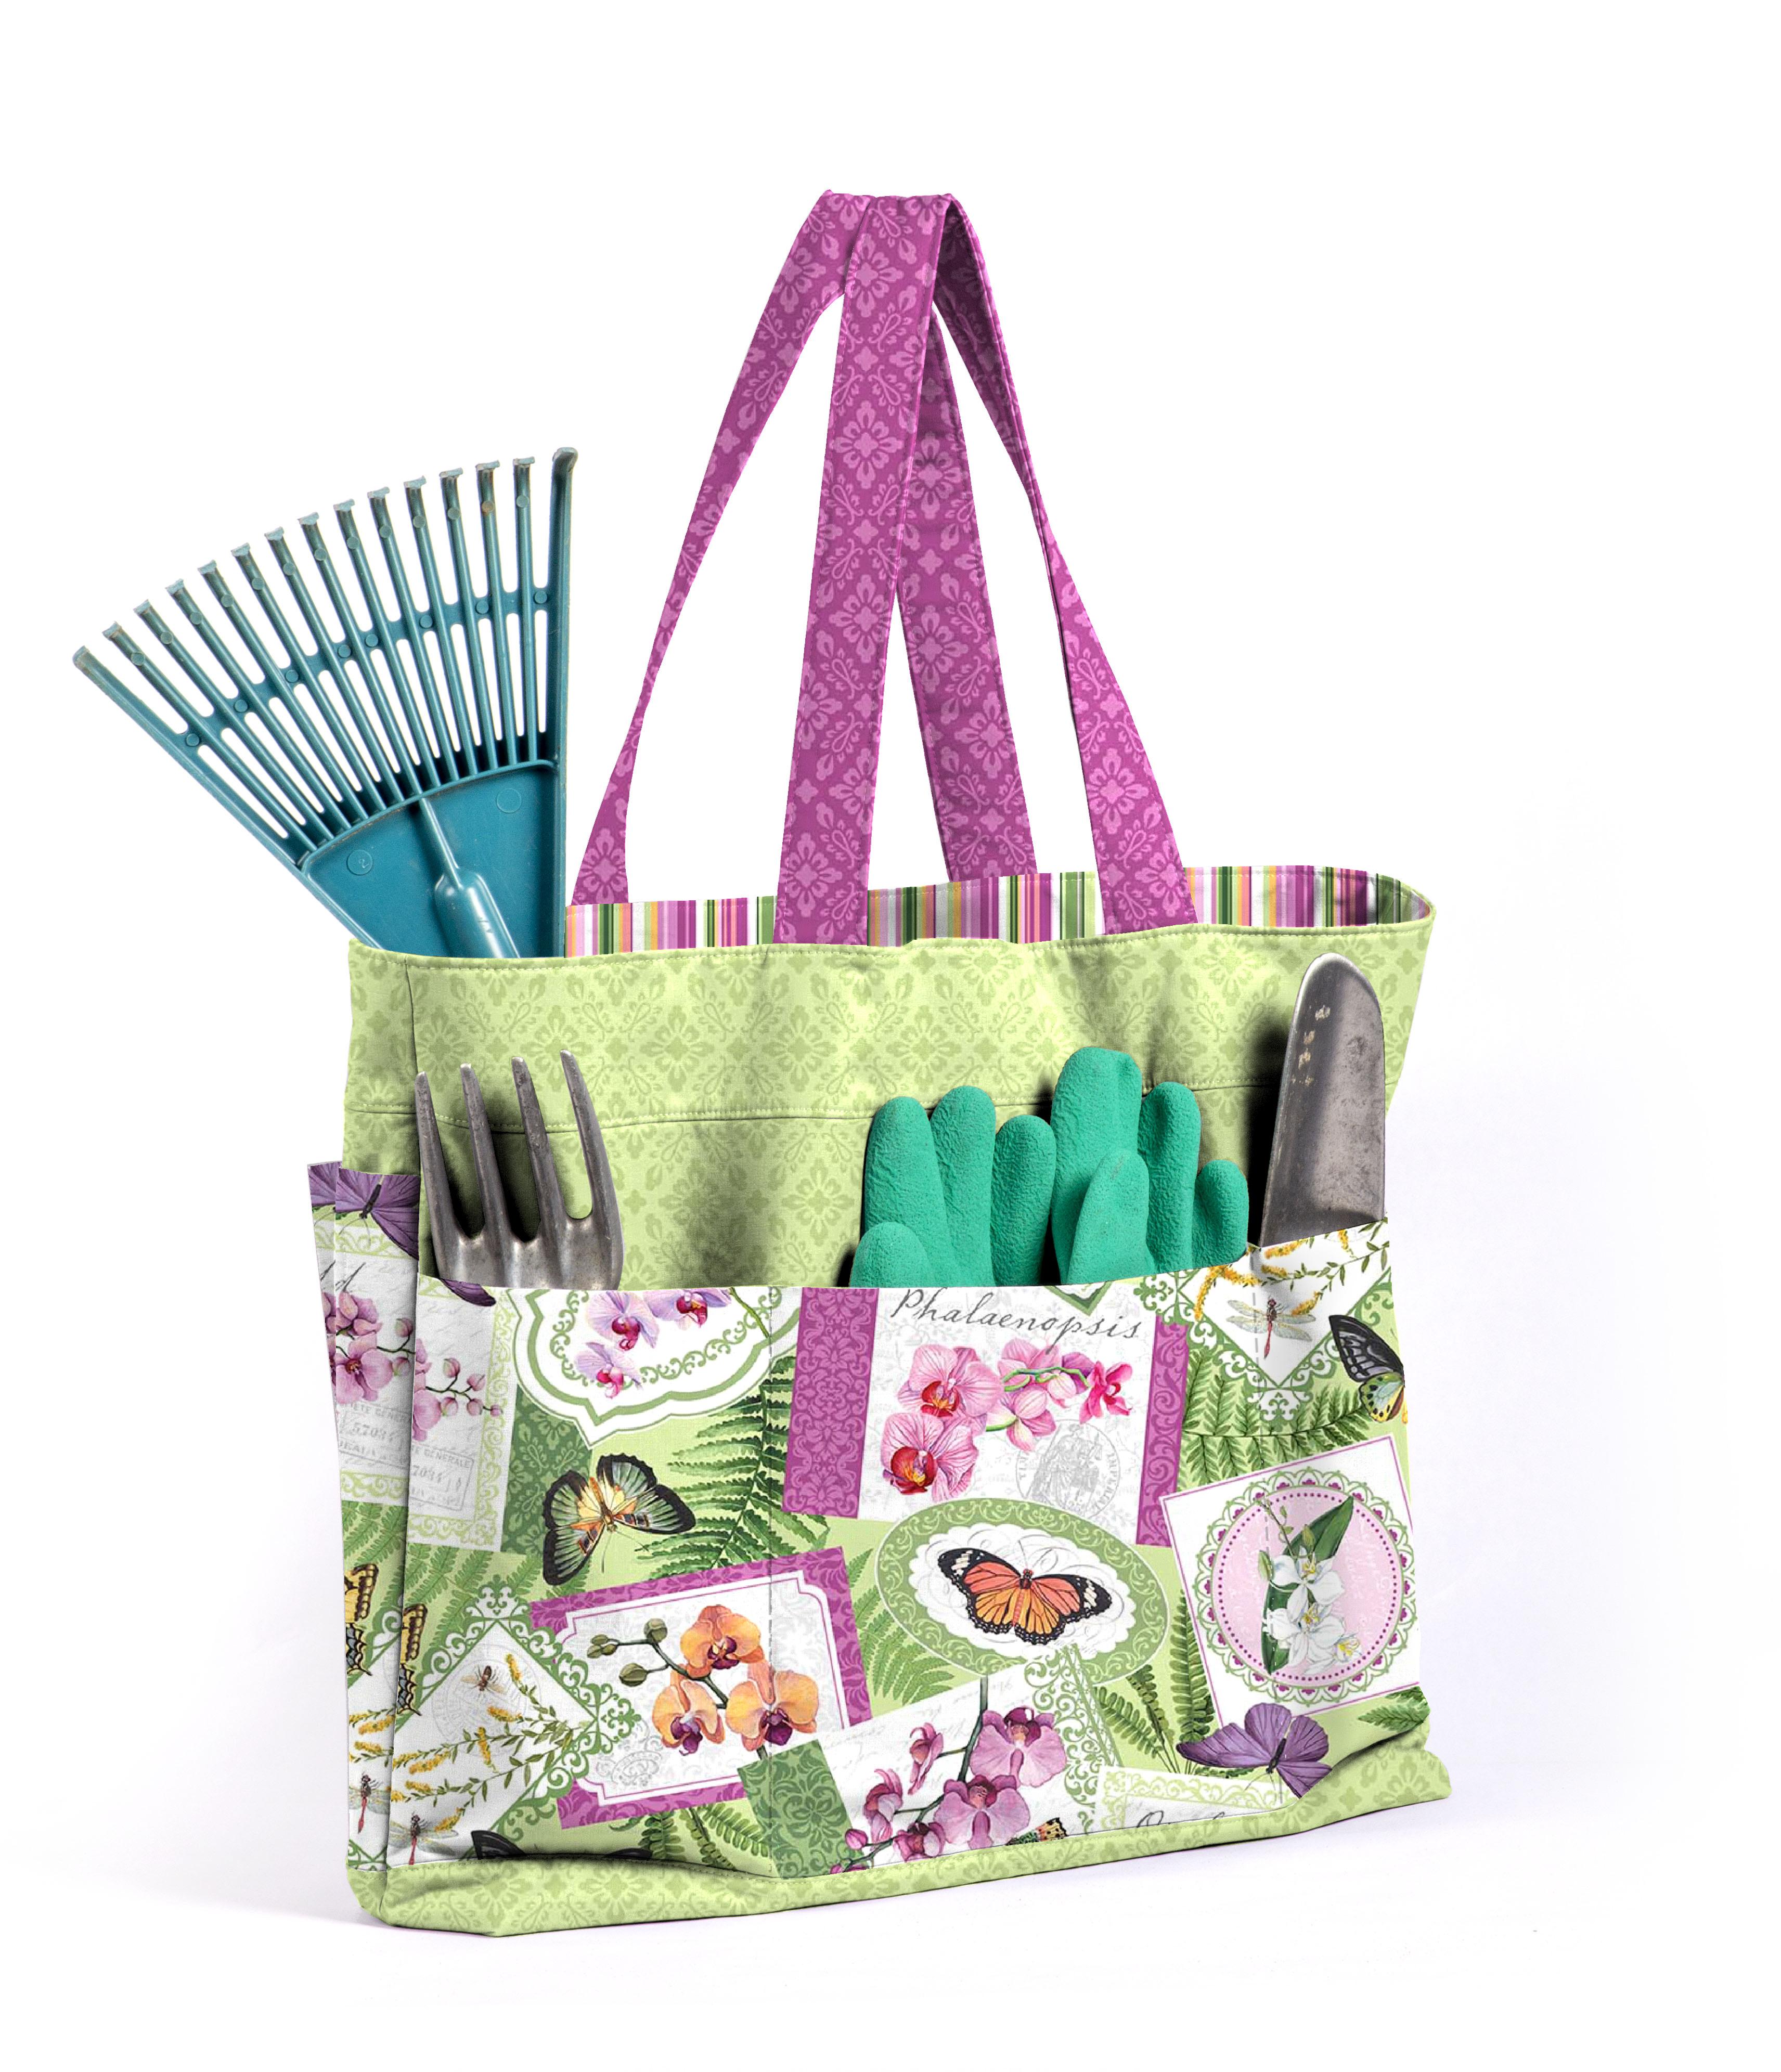 Orchids in Bloom Versatile Tote Bag